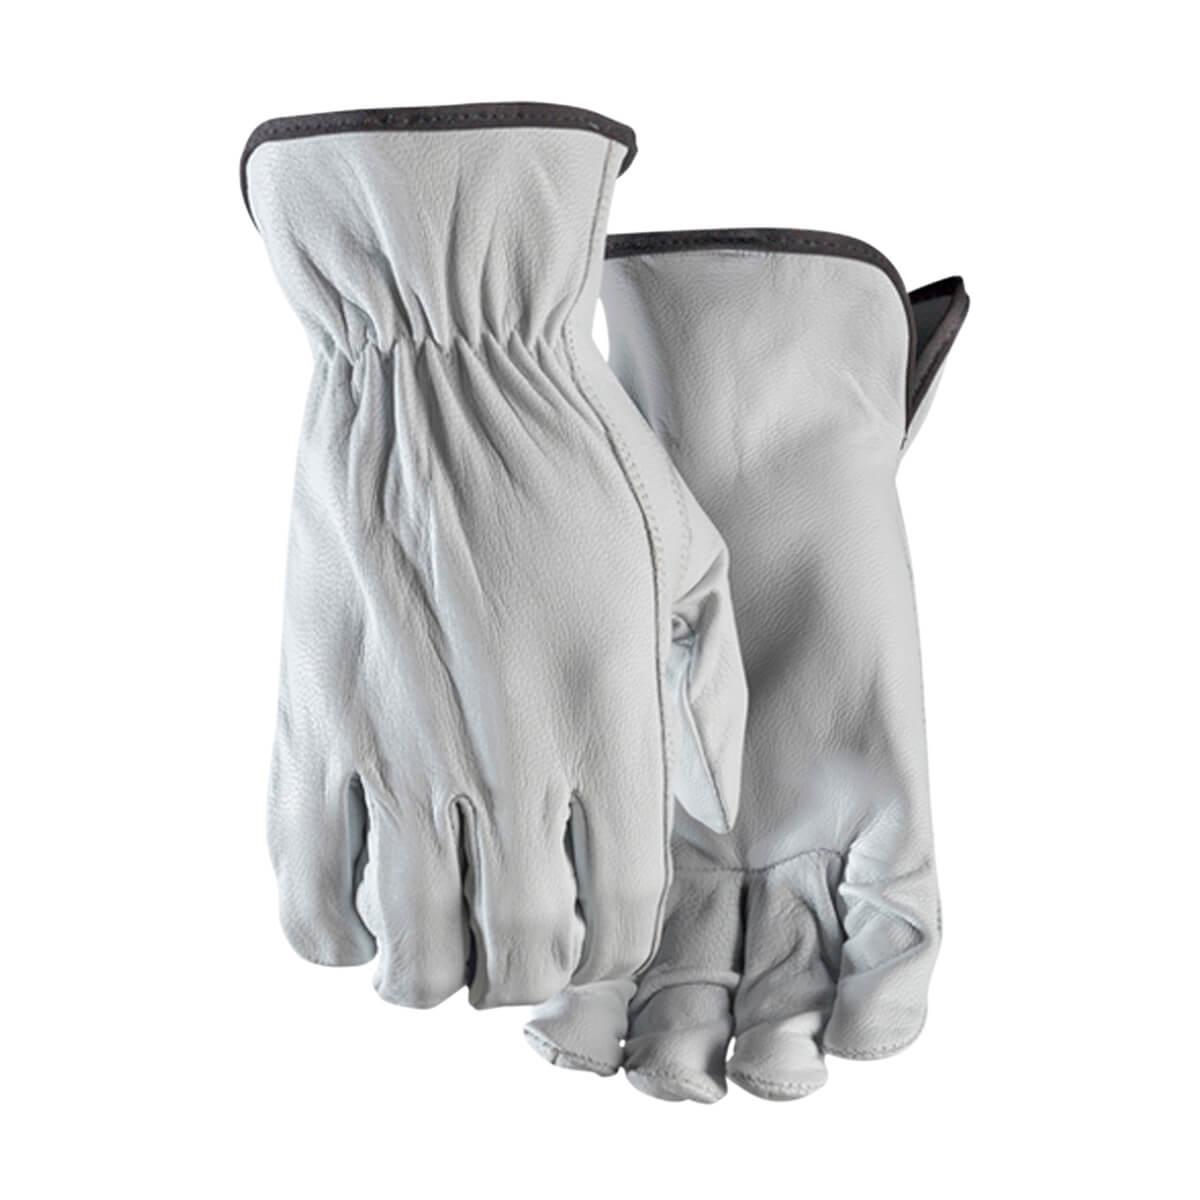 Scape Goat Gloves